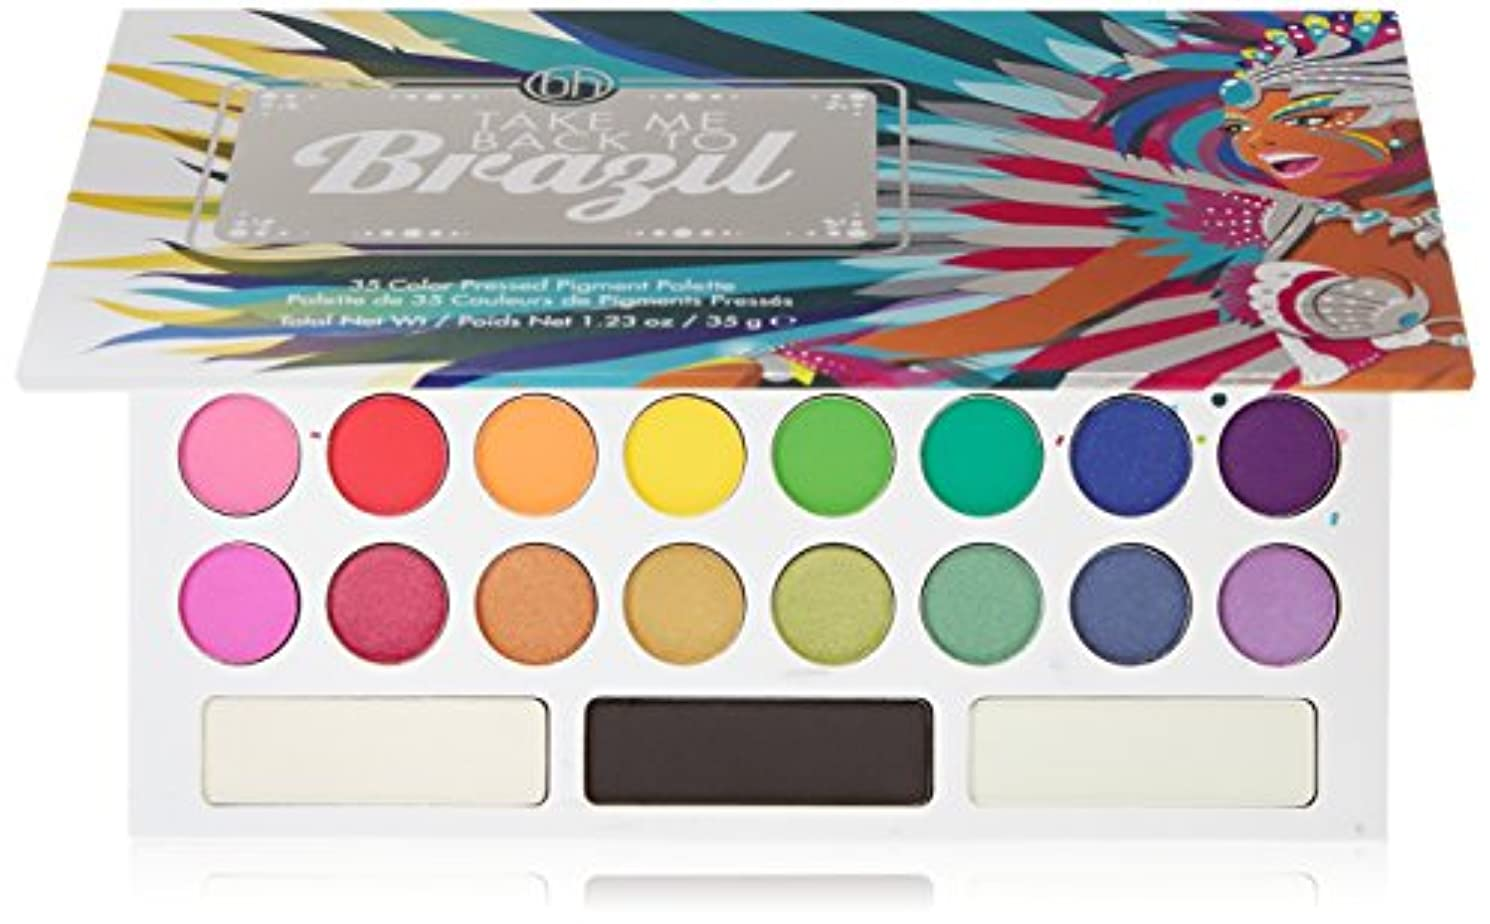 受信機地下室社員BH Cosmetics Take Me Back To Brazil - 35 Color Pressed Pigment Palette